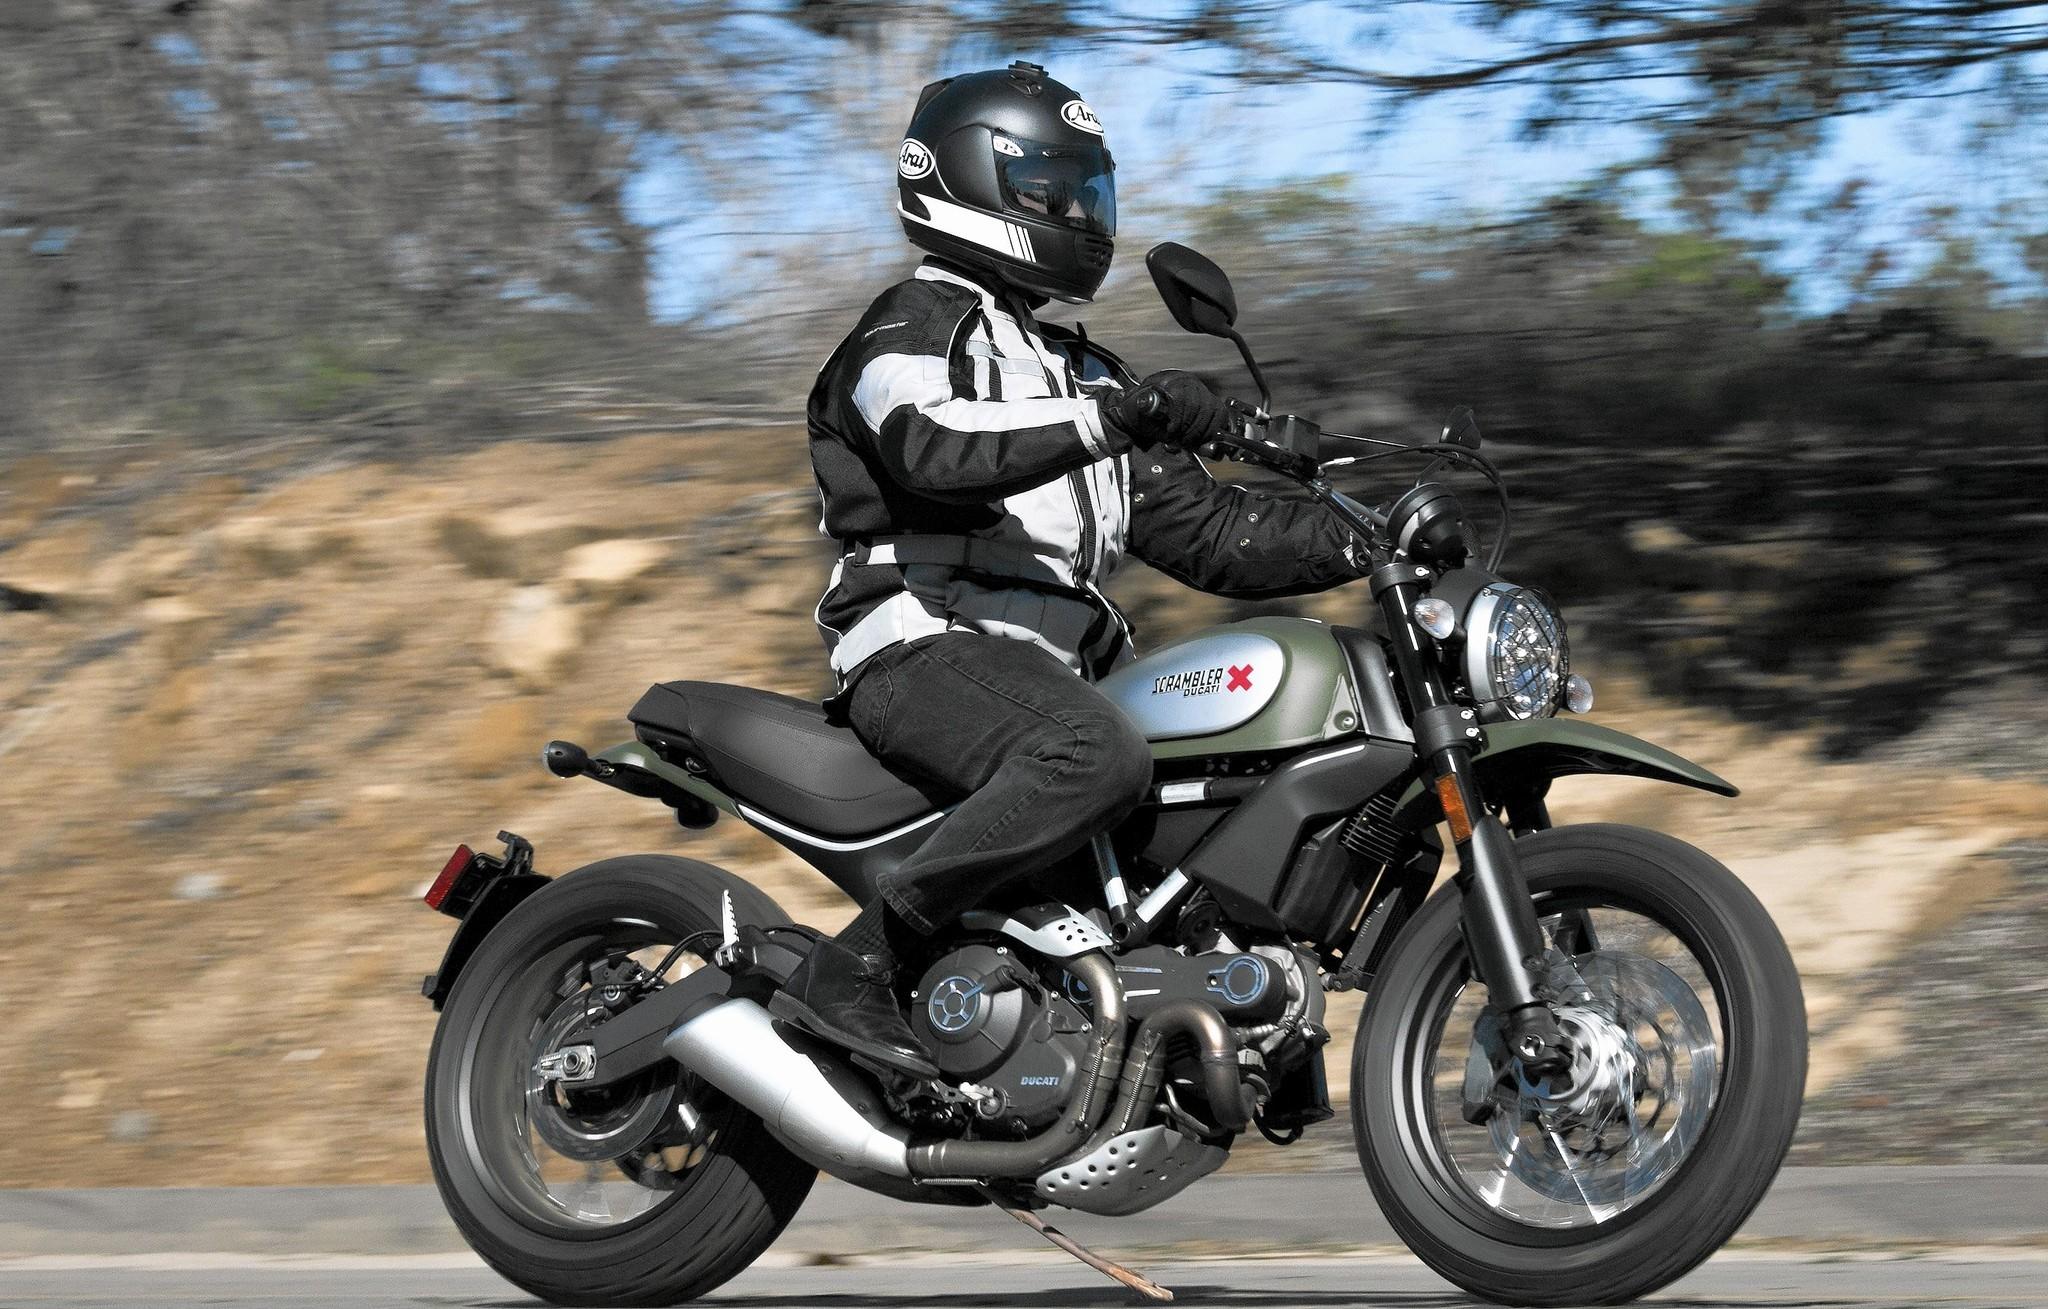 Ducati Scrambler Urban Enduro Seat Height